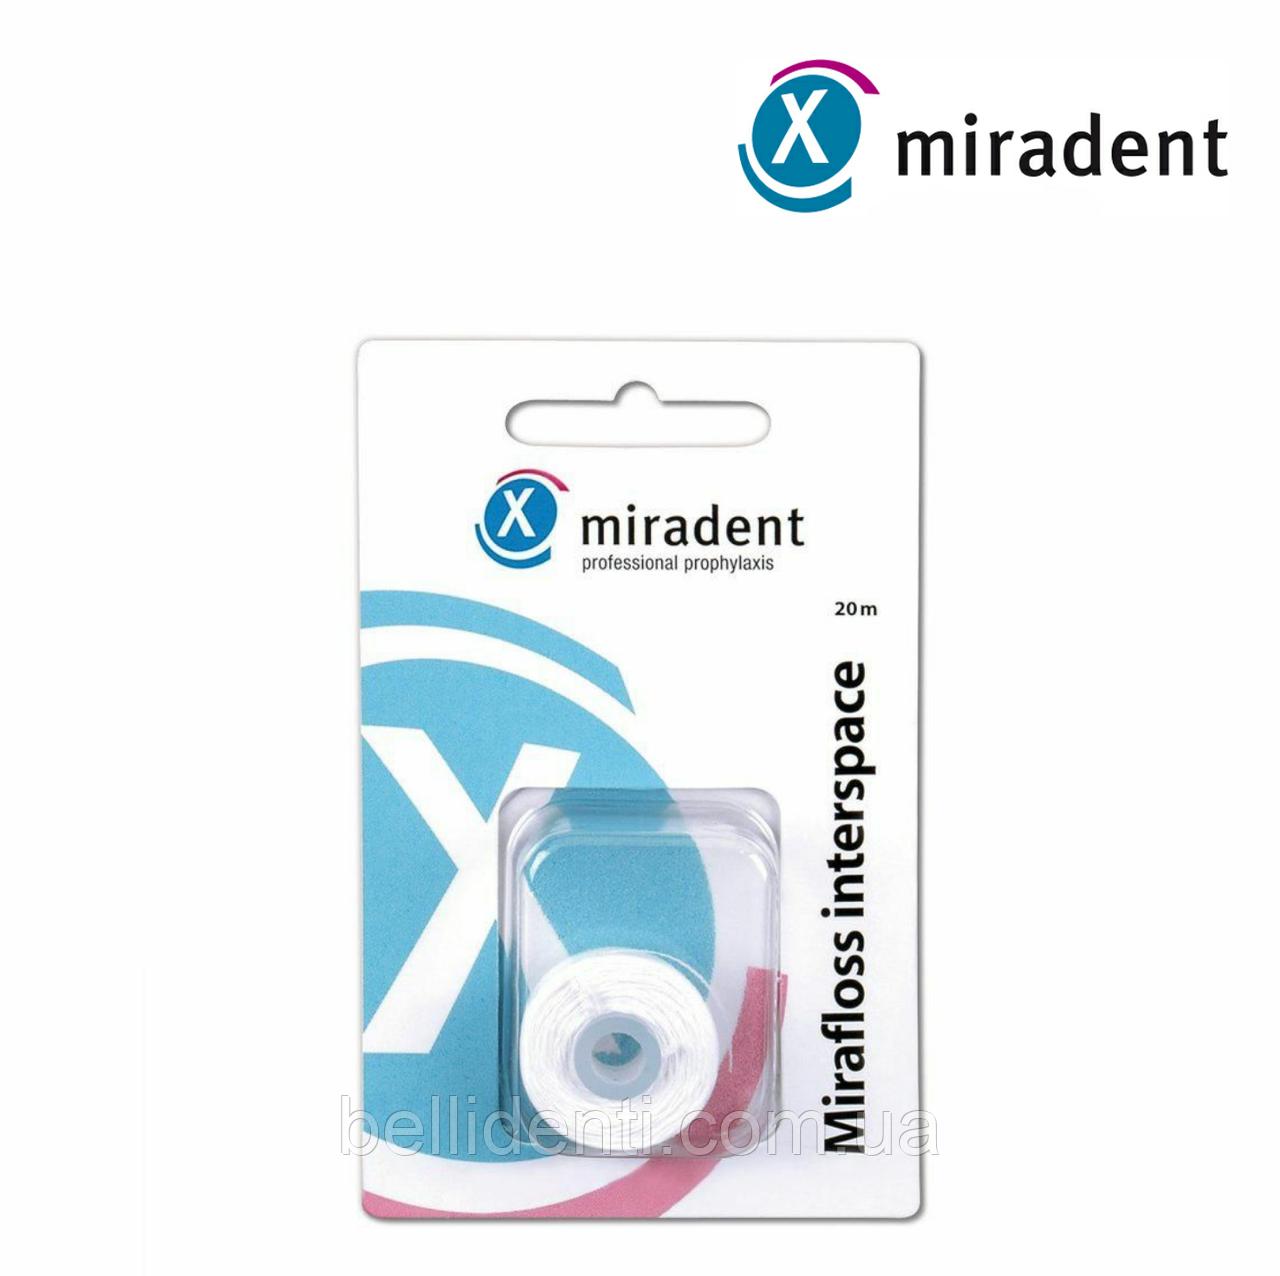 Сменный флос к miradent Mirafloss Interspace (20м)